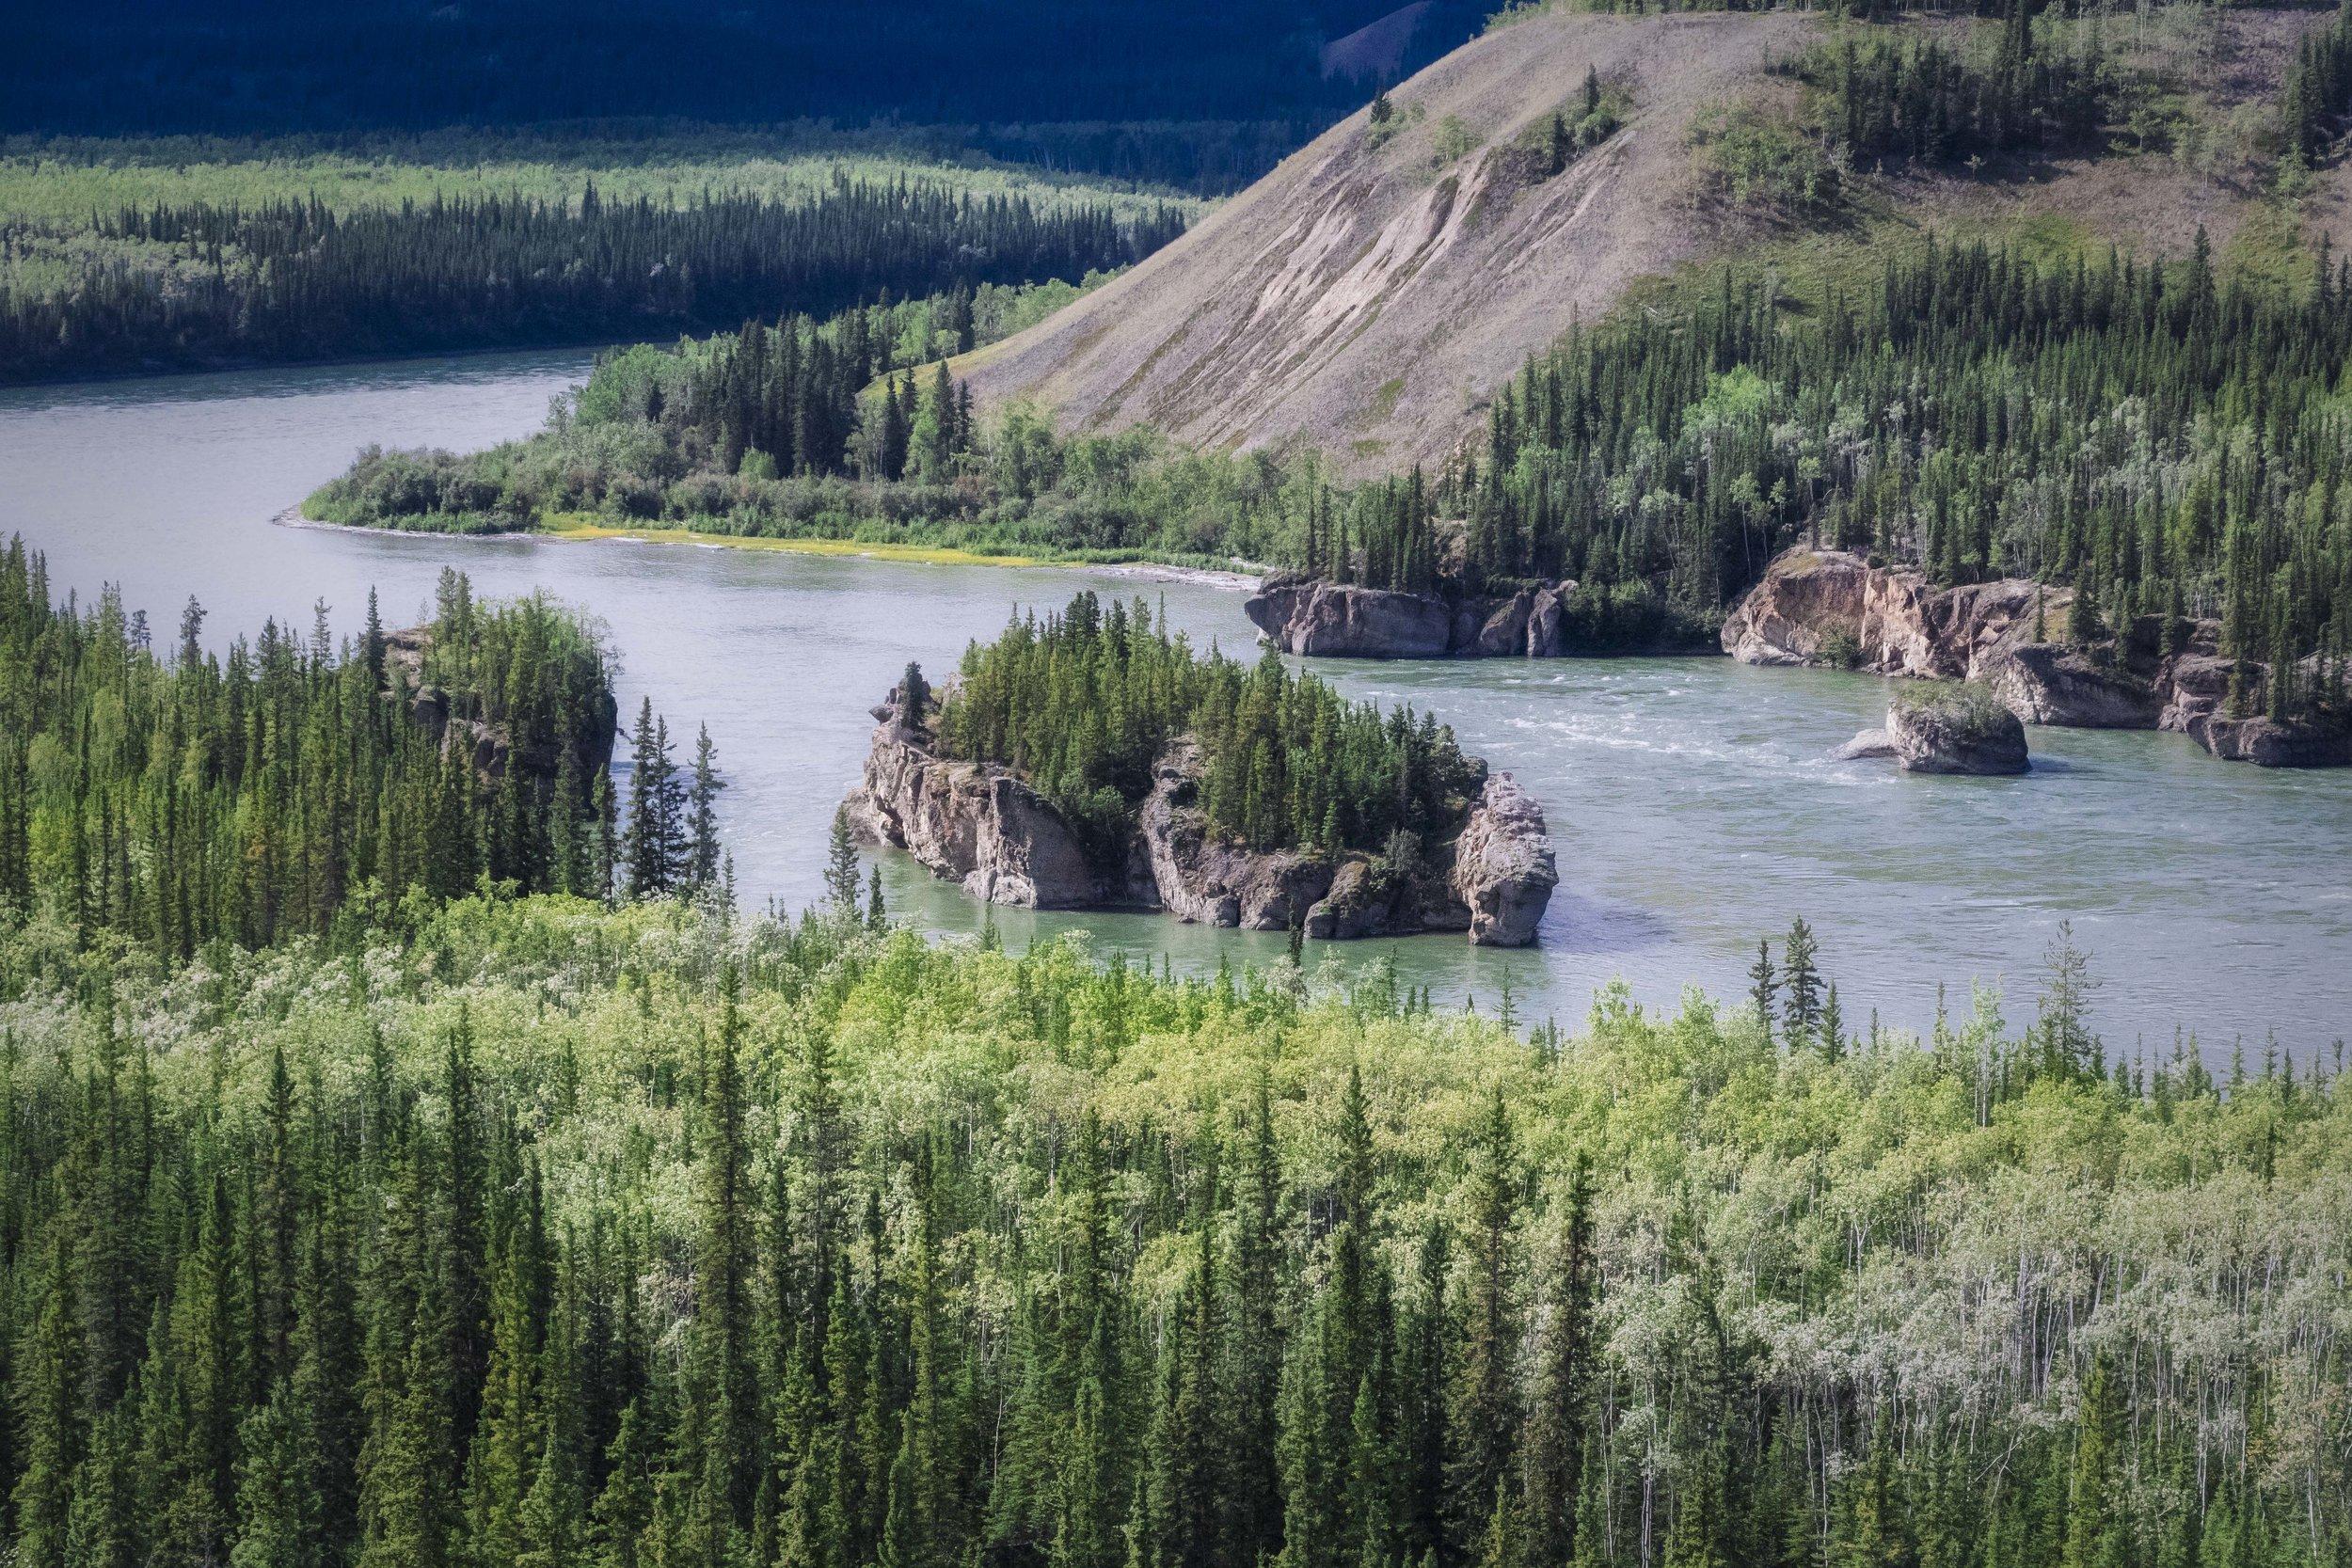 Dempster Highway, Roadtrip, Landscape, Arctic, rob gubiani, Tundra, Tombstone, Tuktoyuktuk, Inuvik, Dempster, Yukon, travel, wanderlust, boreal, forest, boreal forest